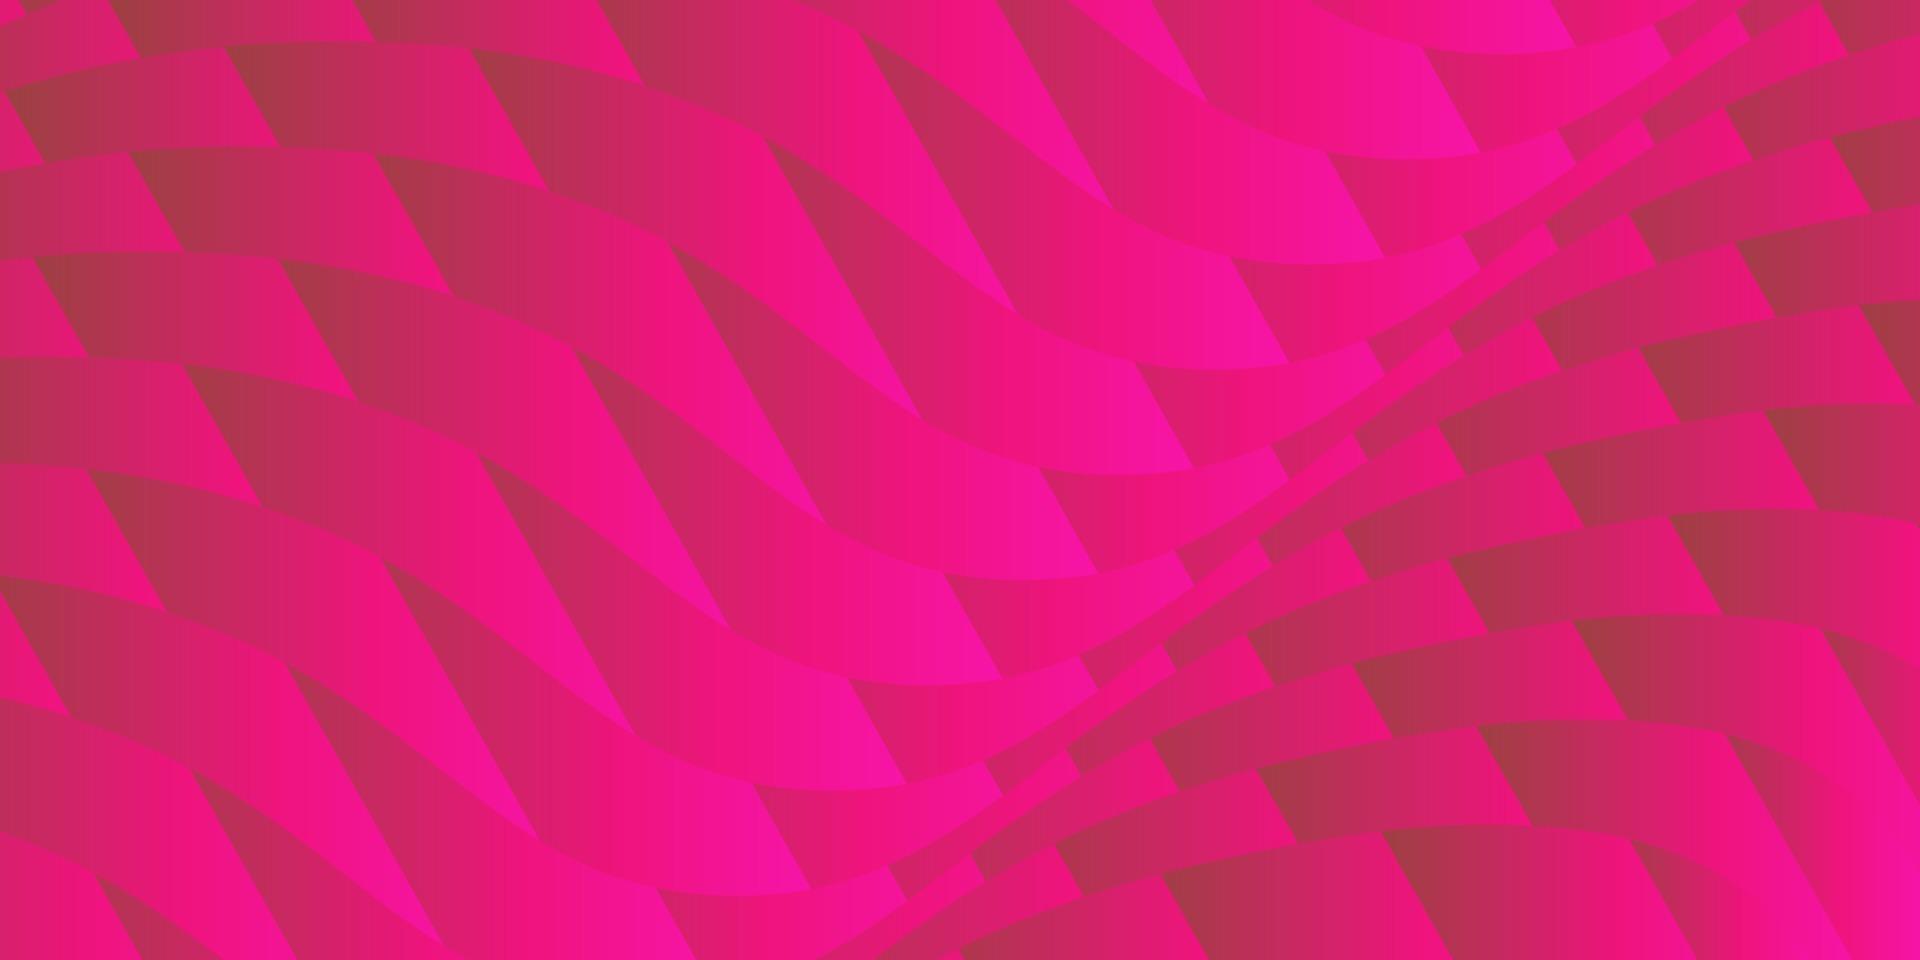 abstracte achtergrond roze vierkante golf vector